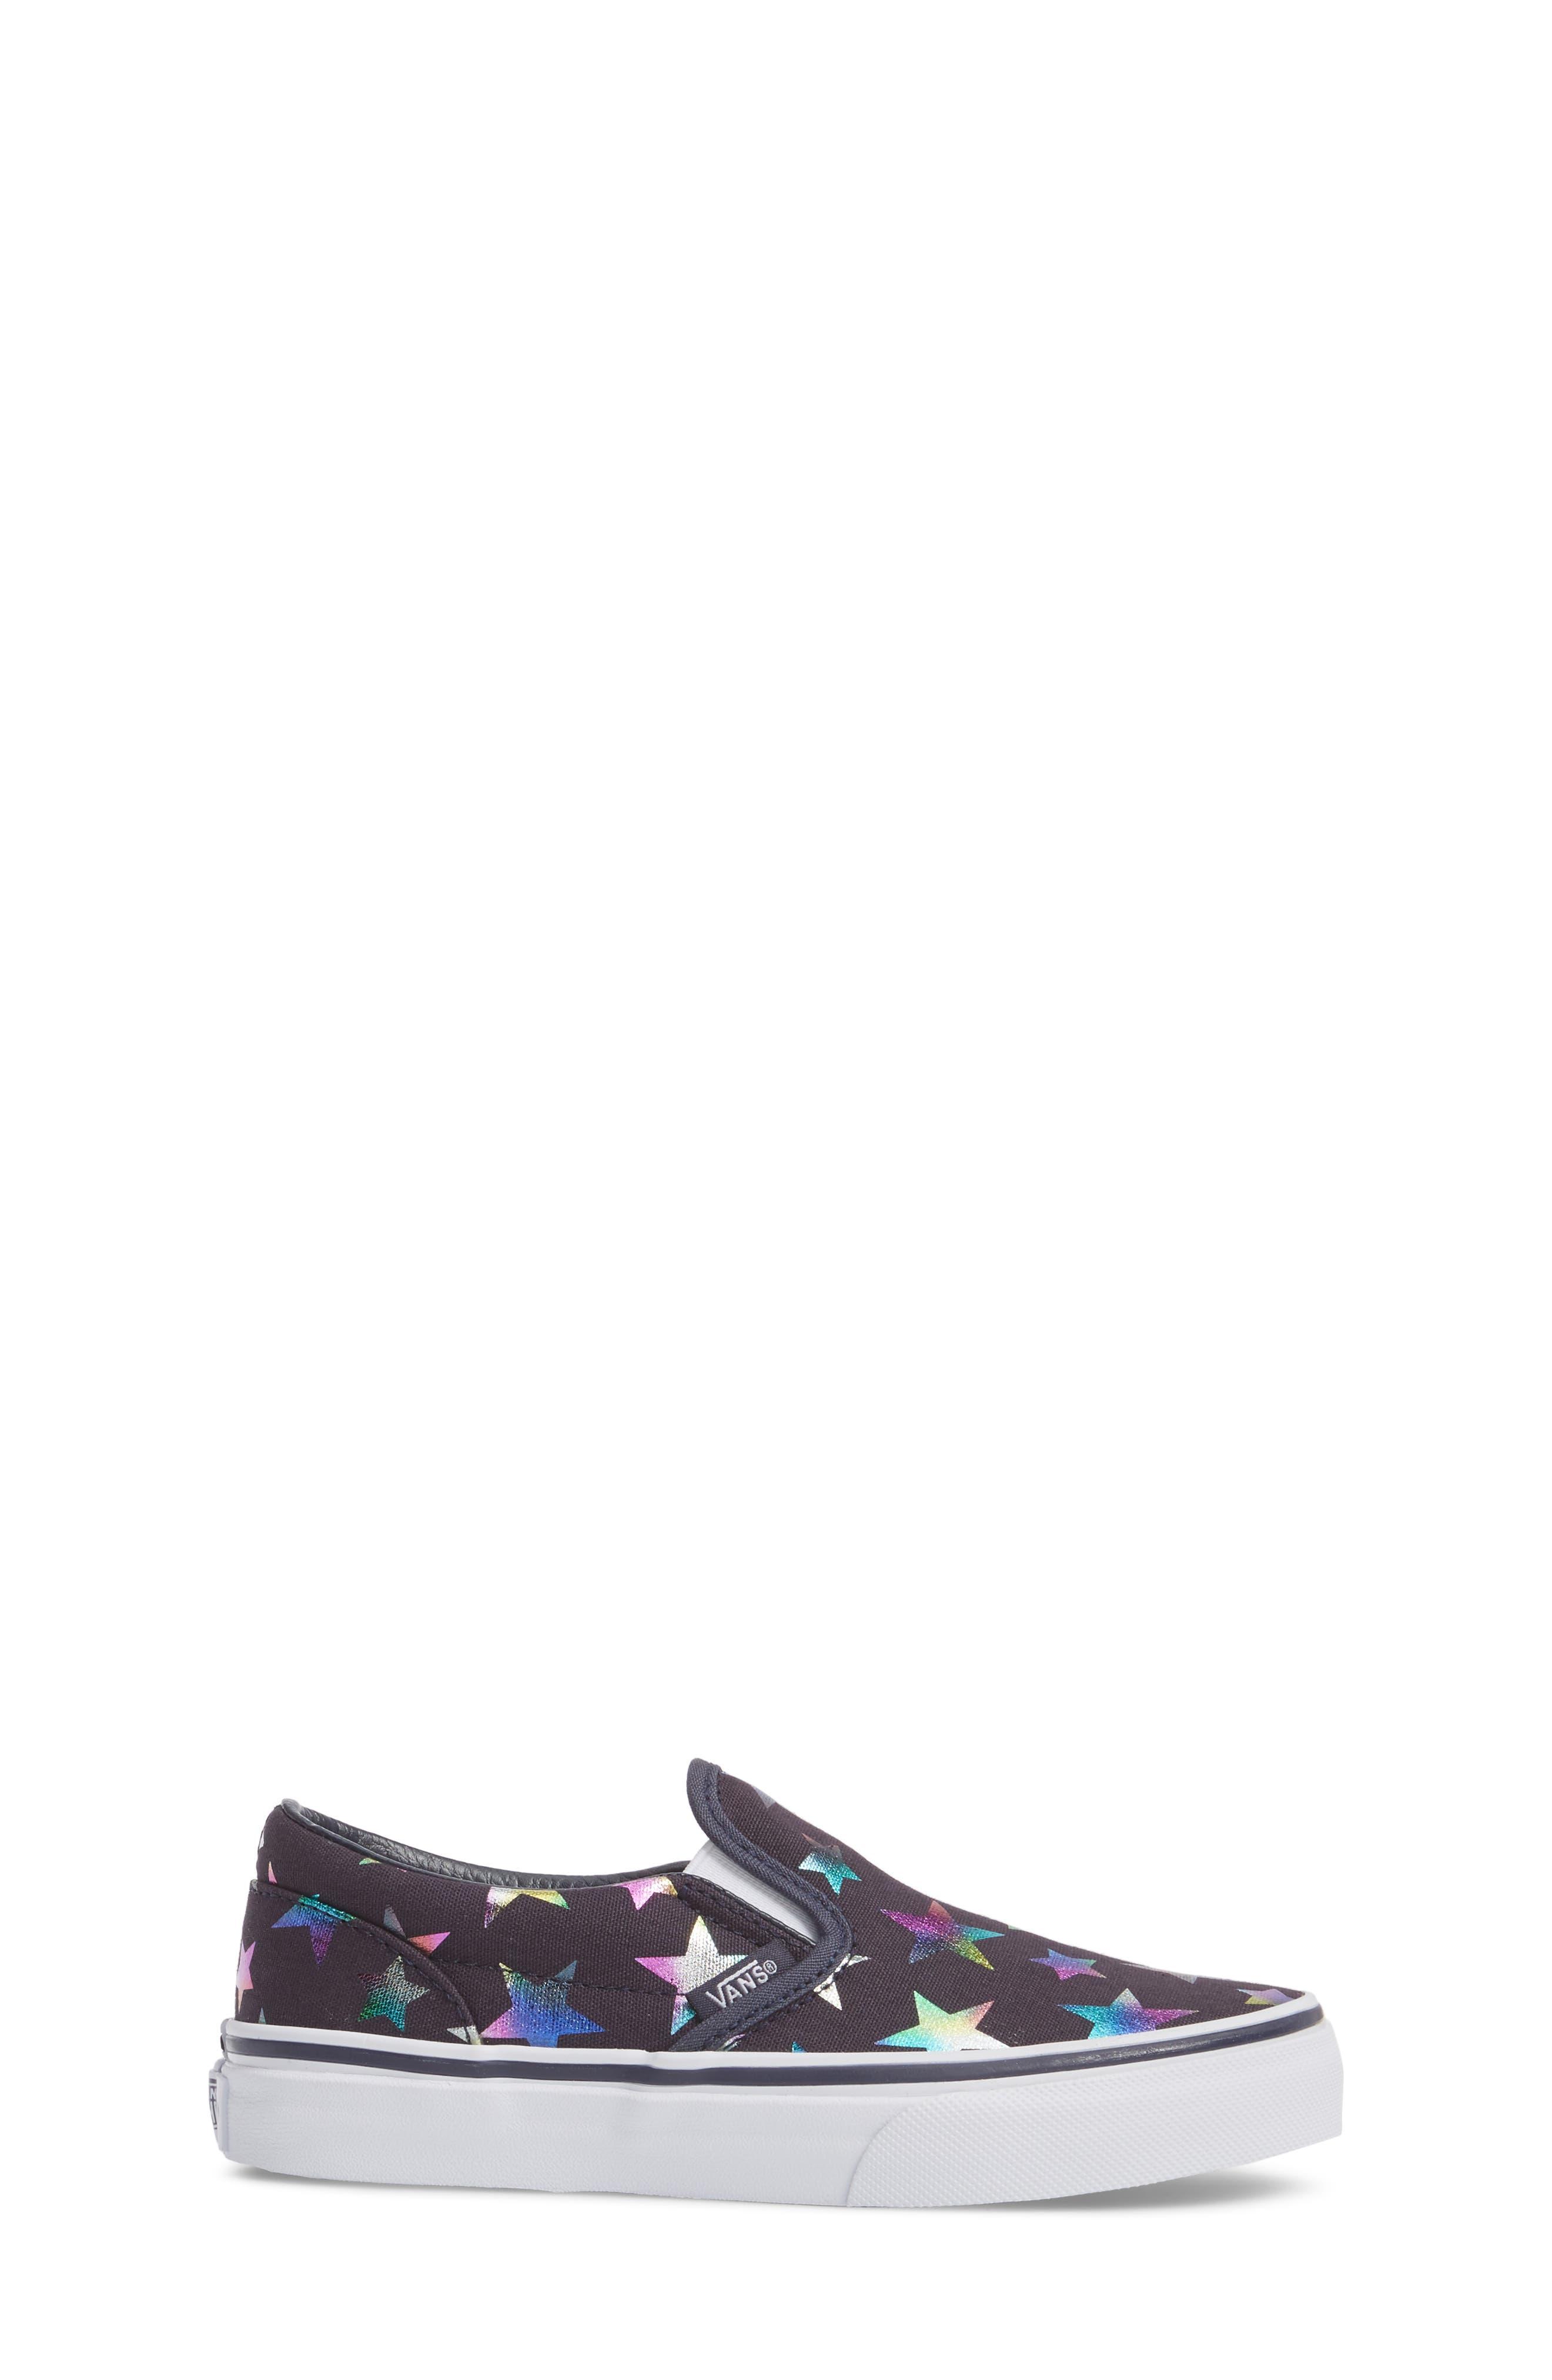 Classic Rainbow Shimmer Star Slip-On Sneaker,                             Alternate thumbnail 3, color,                             Parisian Night Foil Stars